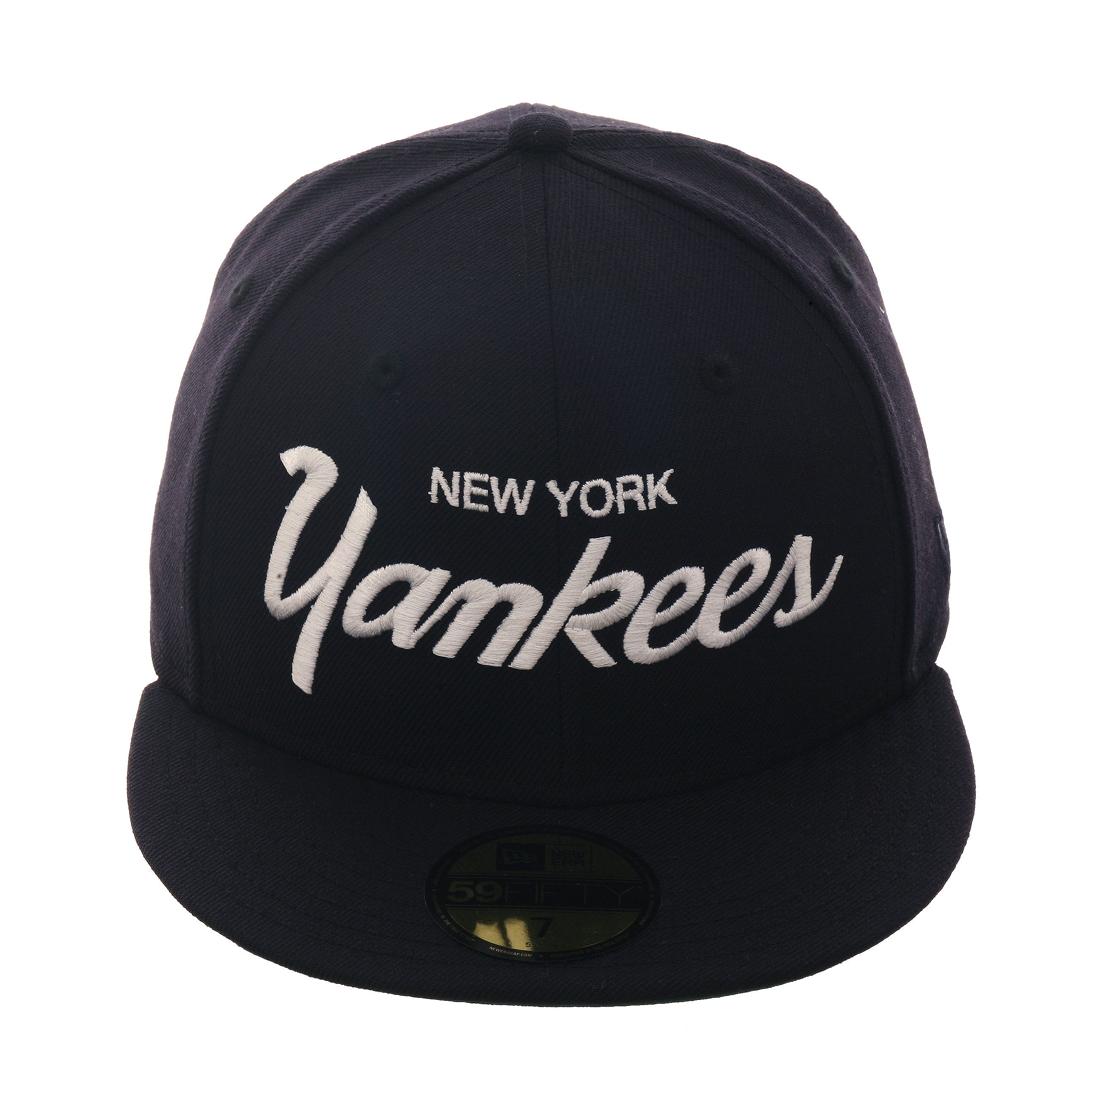 Exclusive New Era 59Fifty New York Yankees Script Hat - Navy 99c7ac7445ed